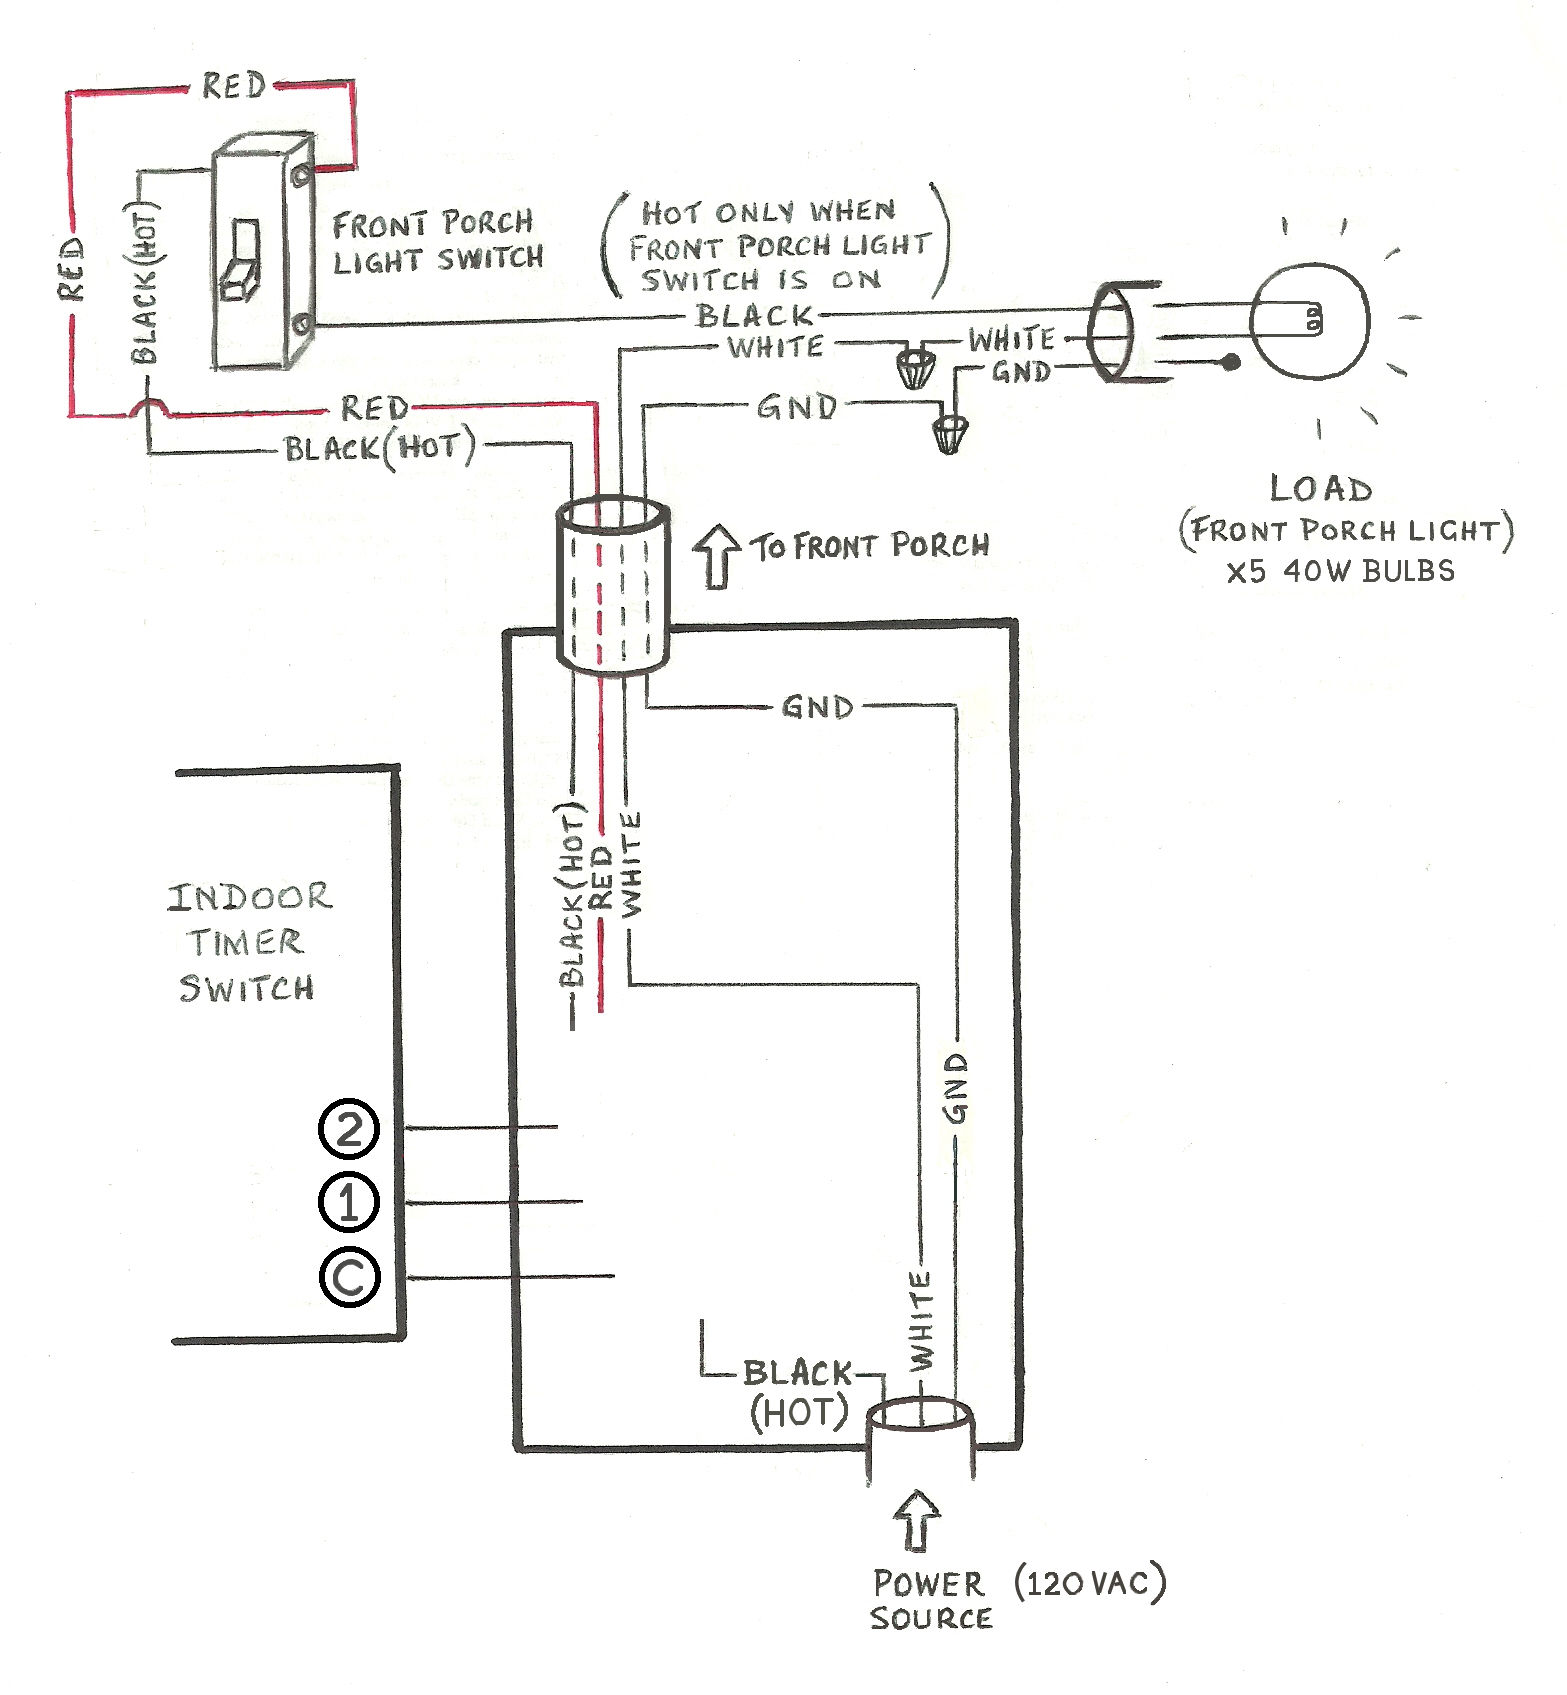 WRG-8370] Wiring Diagram Limitorque 1473 on jackson rr3, jackson jx10, jackson dinky black,